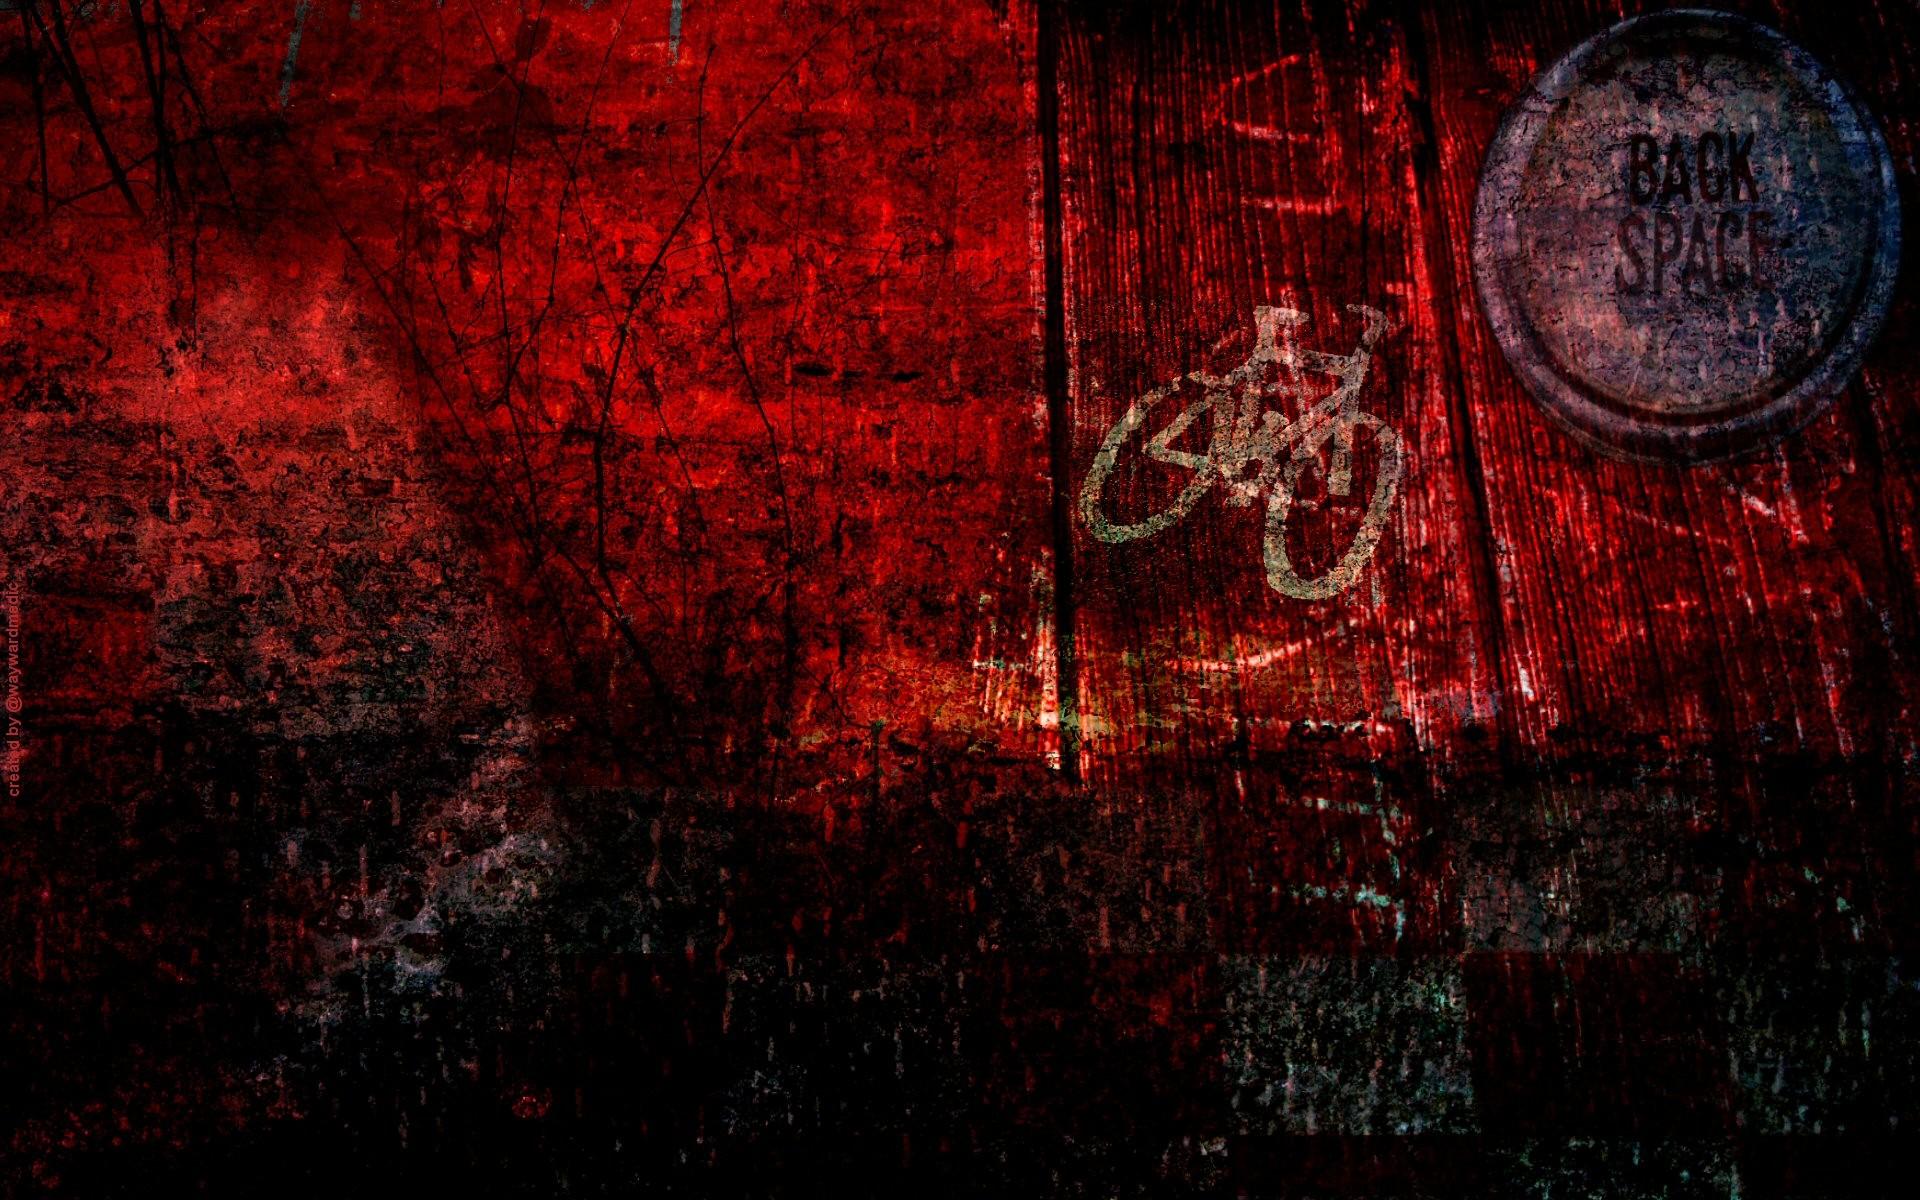 Red grunge twitter background by waywardmedic Red grunge twitter background  by waywardmedic